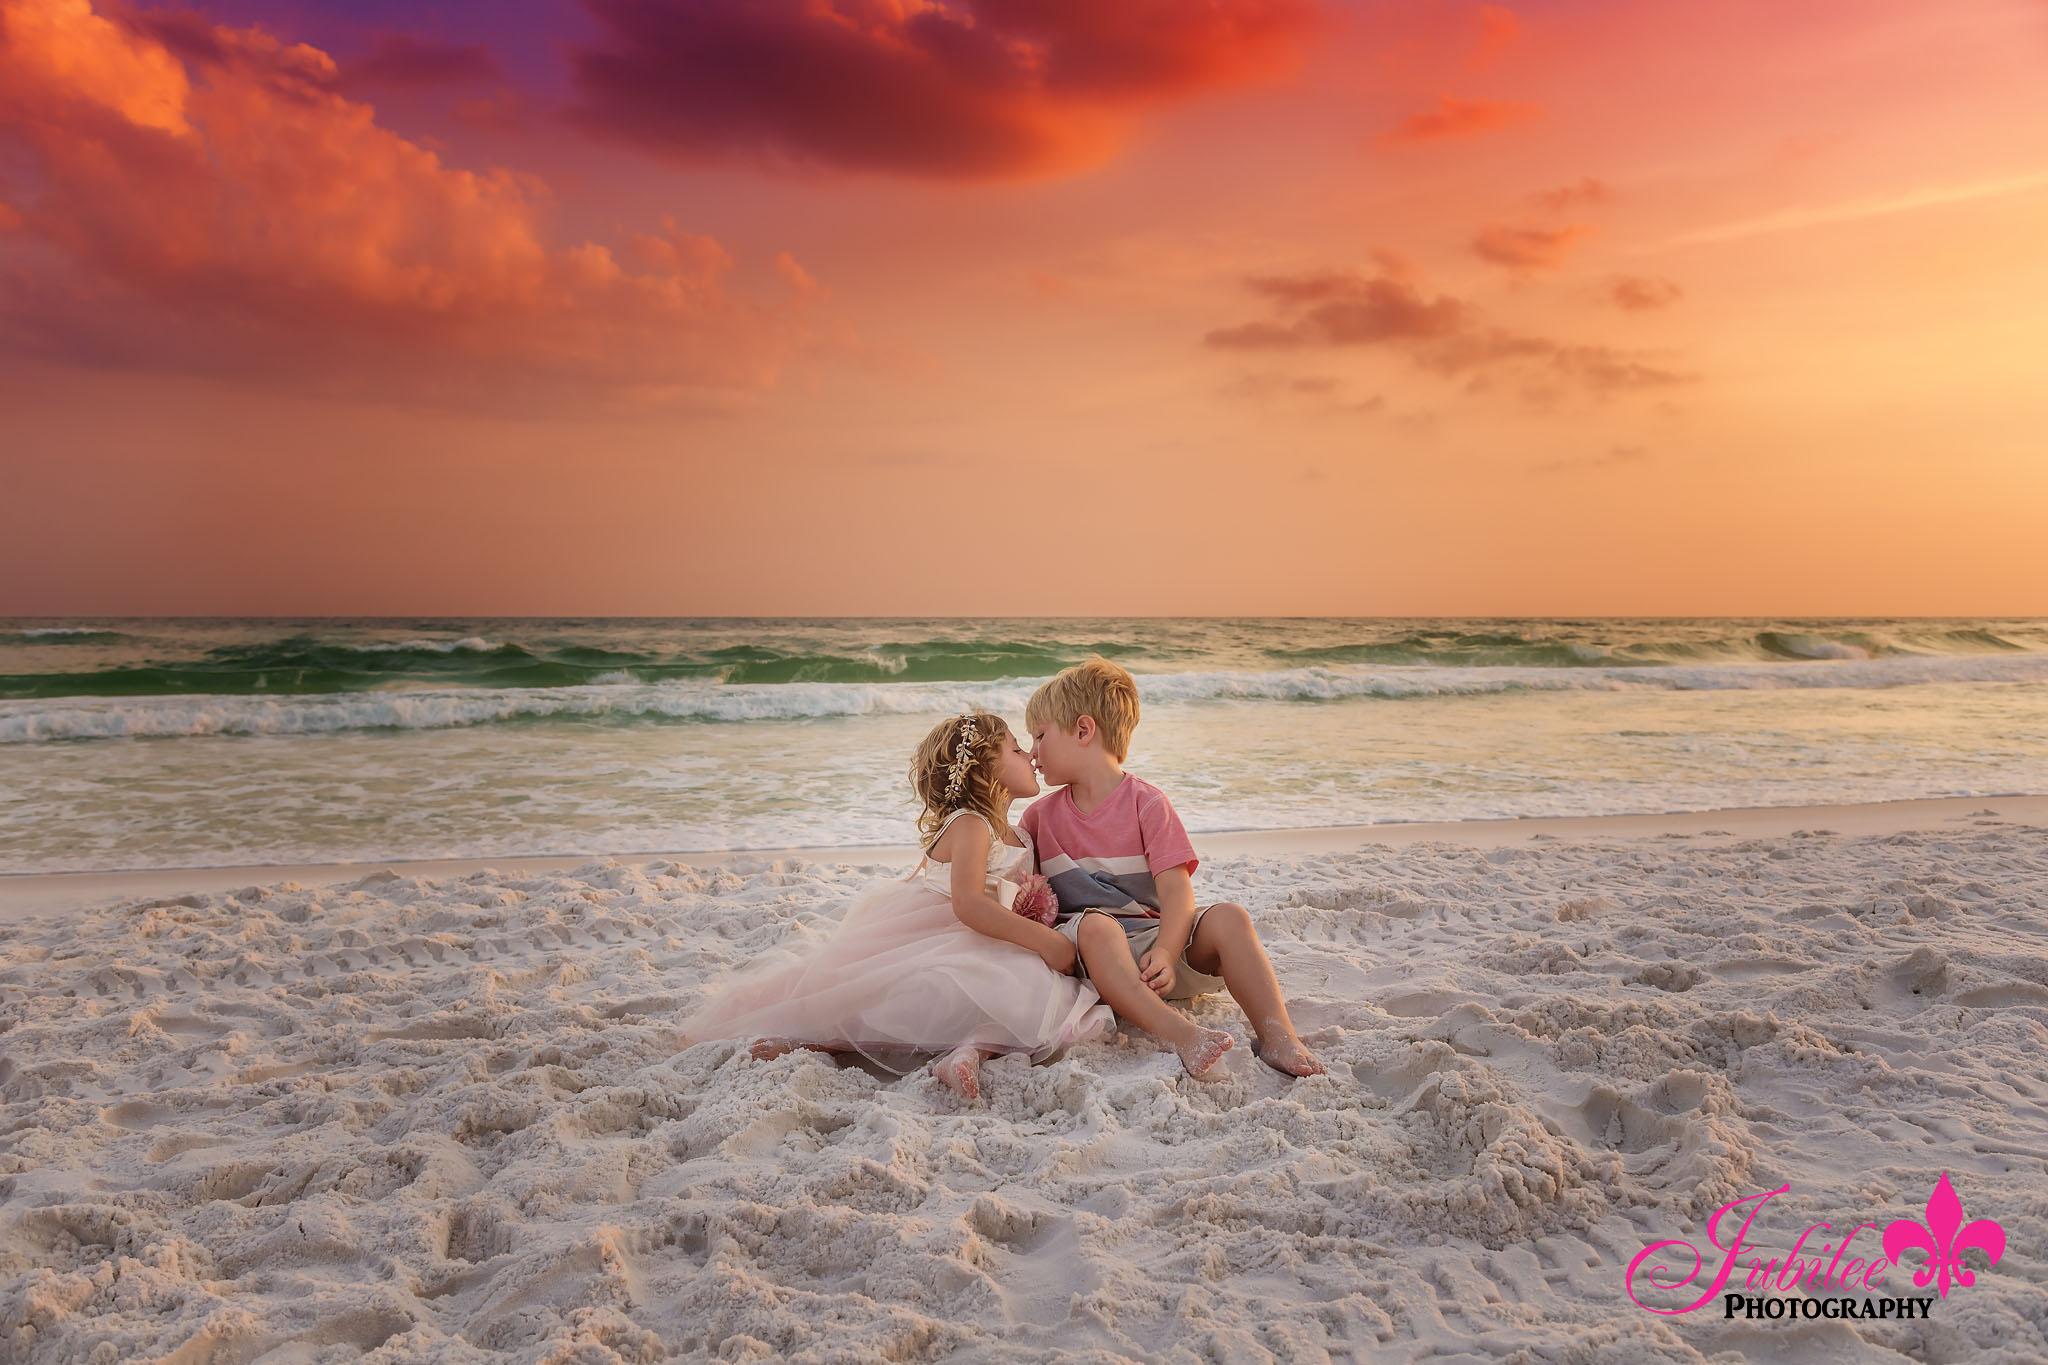 destin_beach_photographer_6194